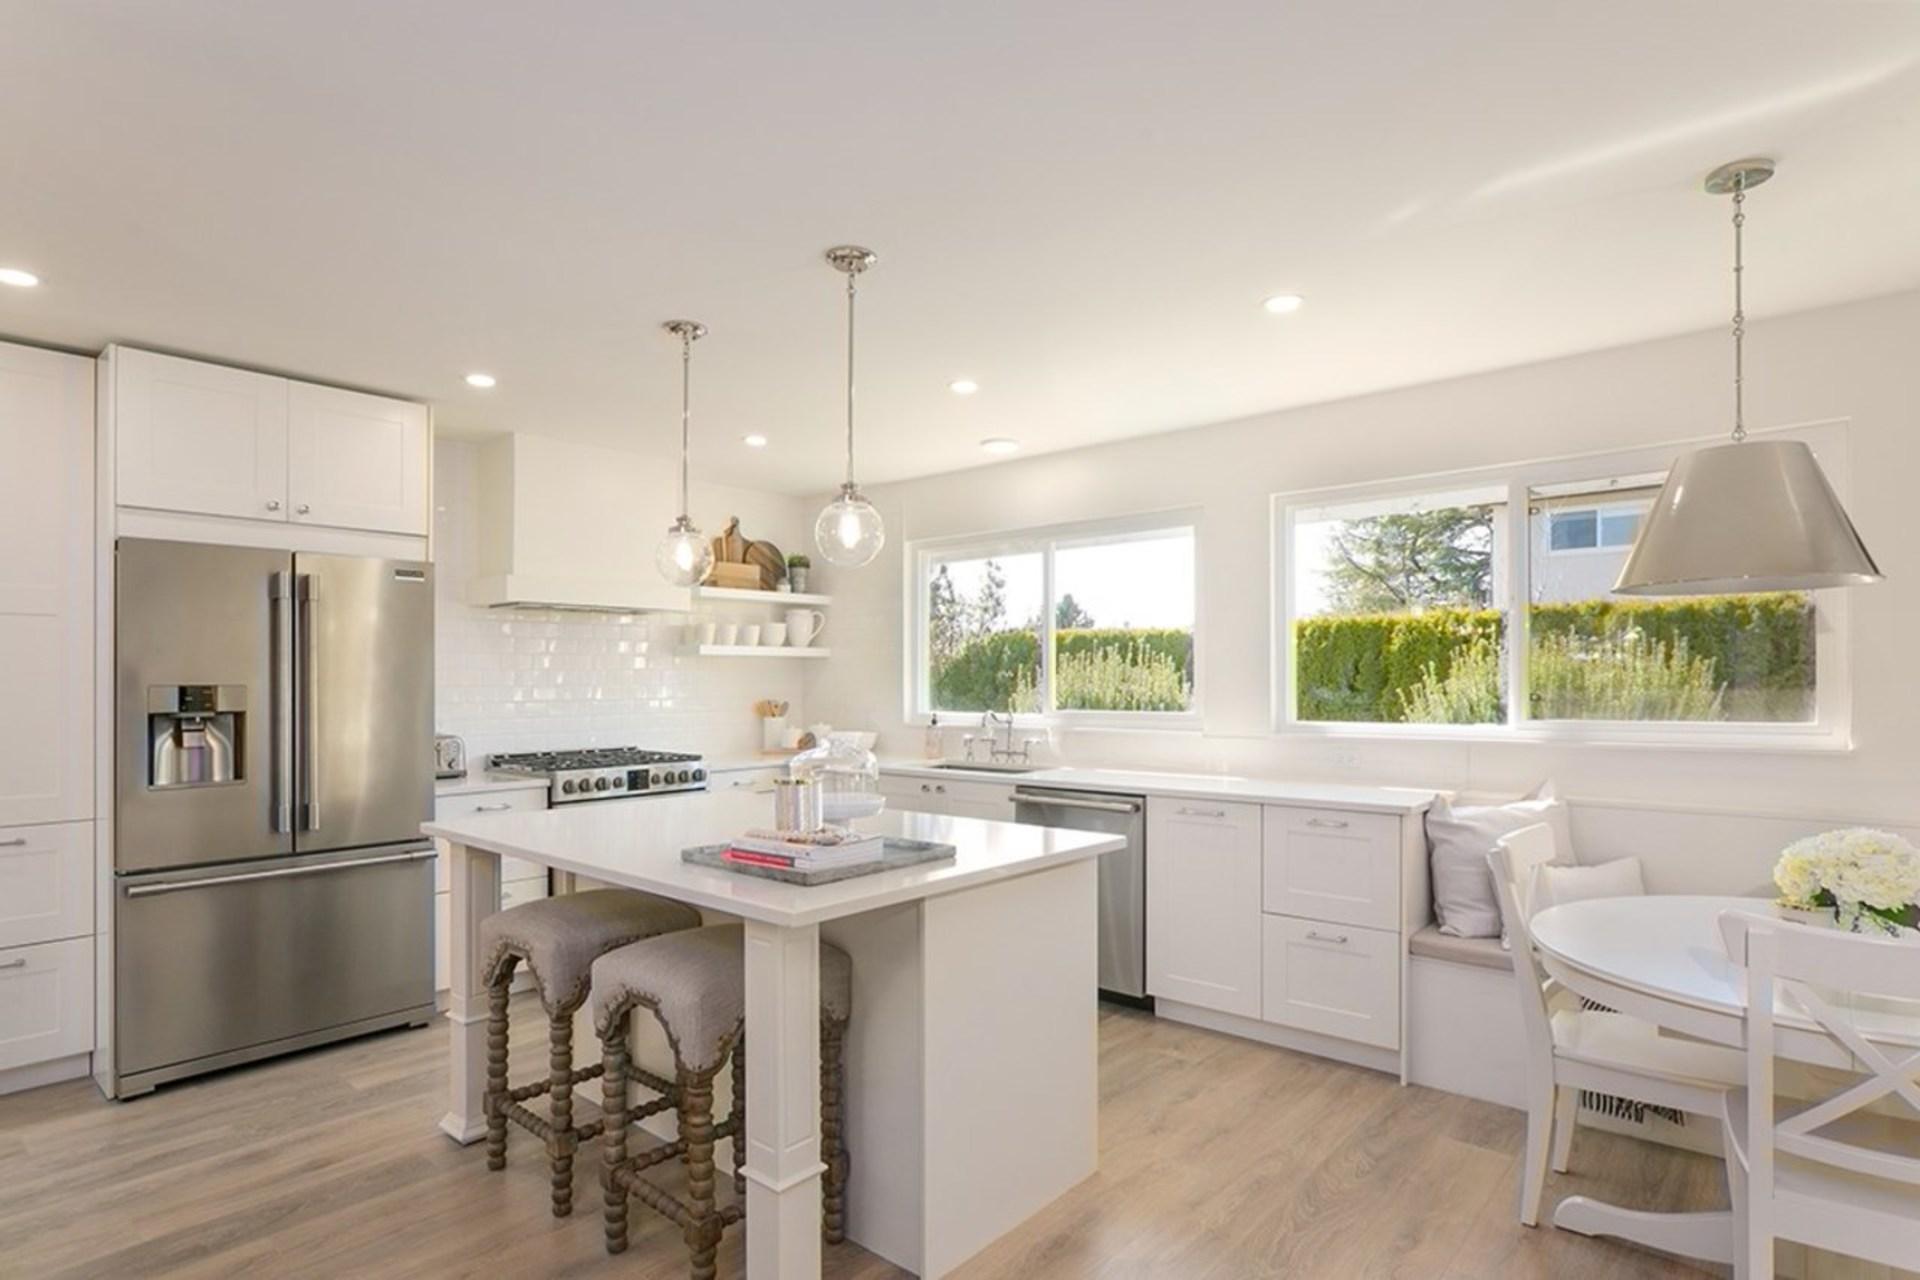 9299-213-street-walnut-grove-langley-06 at 9299 213 Street, Walnut Grove, Langley